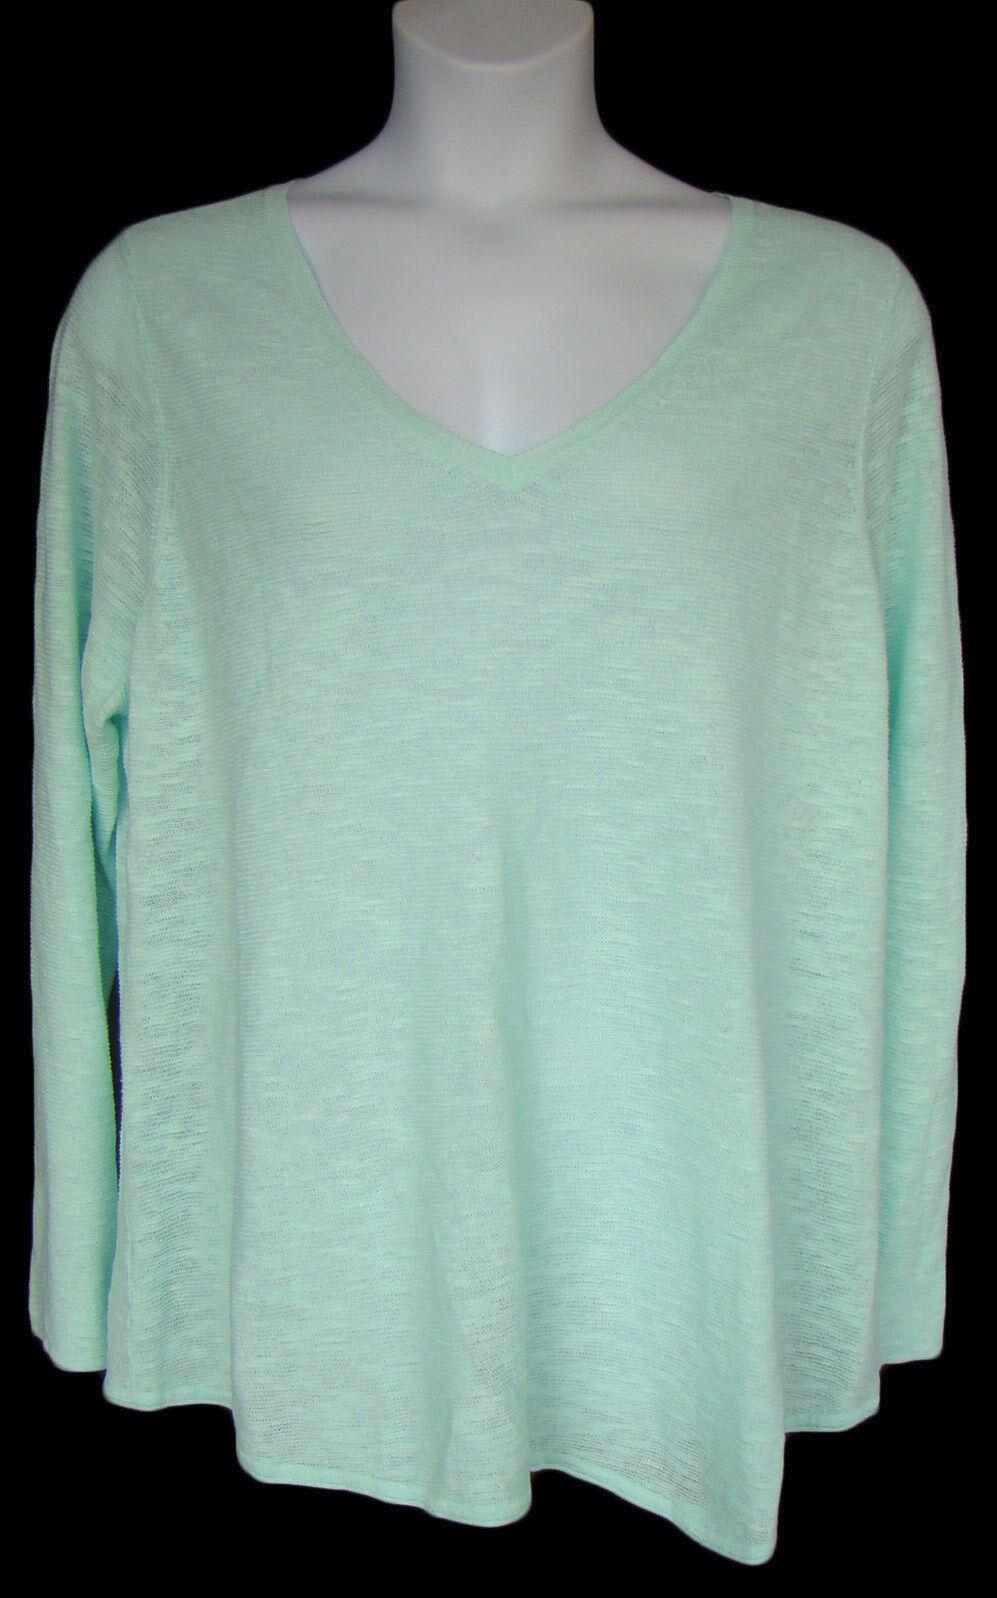 EILEEN FISHER Storlek 3X Pale Aqua Organic Linen Cotton Pulver tröja NWT